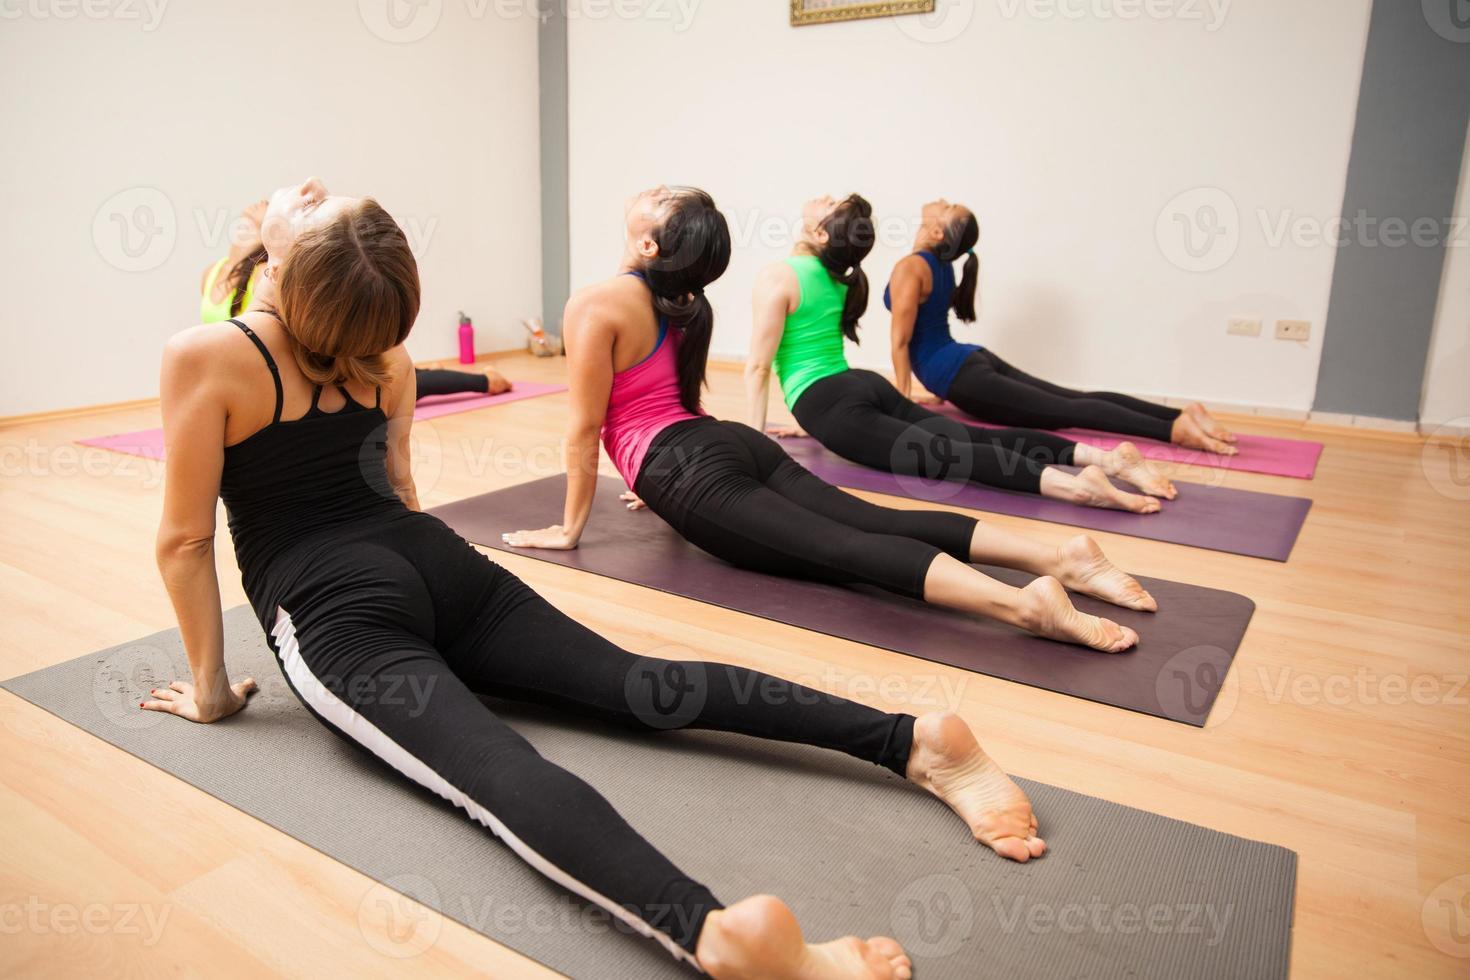 Kobra-Pose im Yoga-Kurs foto